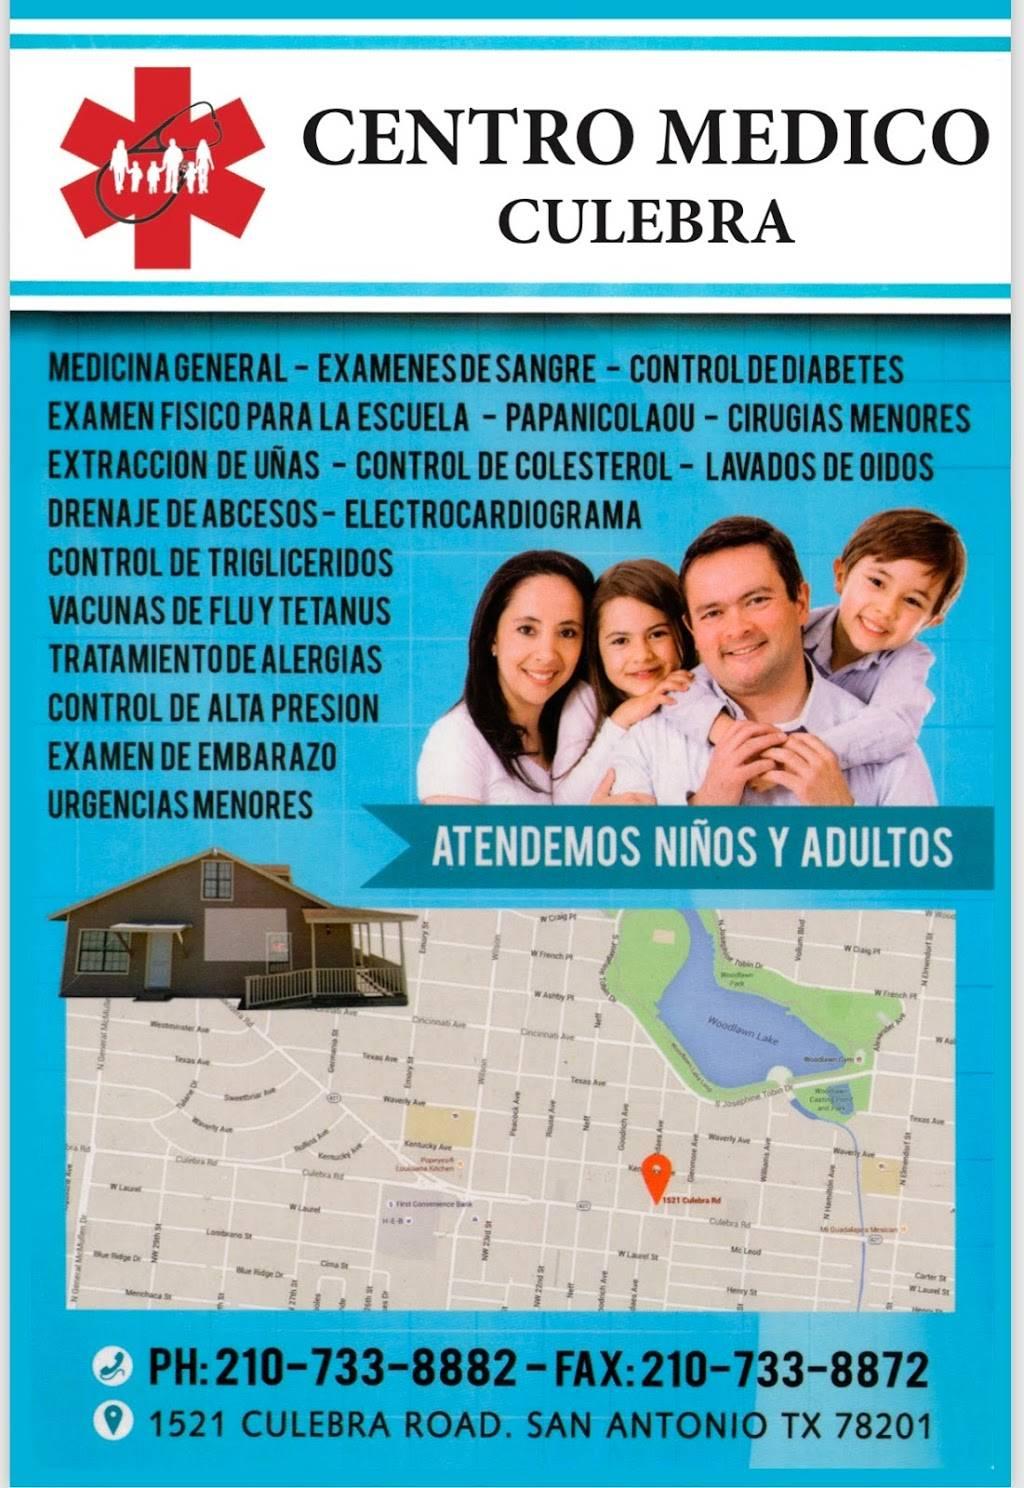 Centro Medico Culebra(Clinica Hispana ) - health  | Photo 4 of 7 | Address: 1521 Culebra Rd, San Antonio, TX 78201, USA | Phone: (210) 733-8882